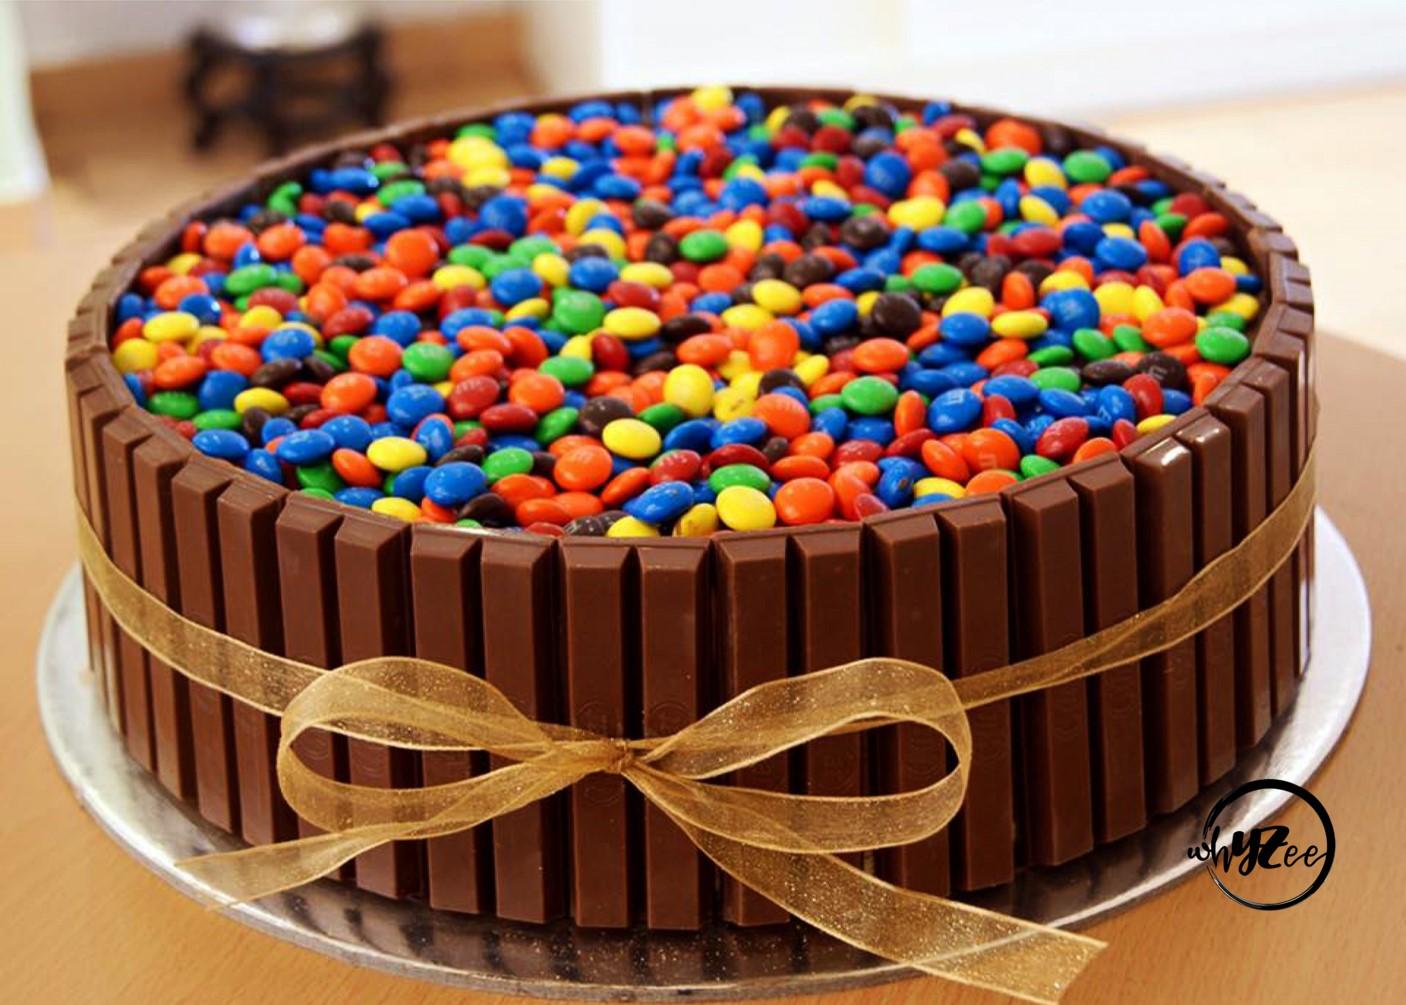 Cake_2020-06-08.jpg